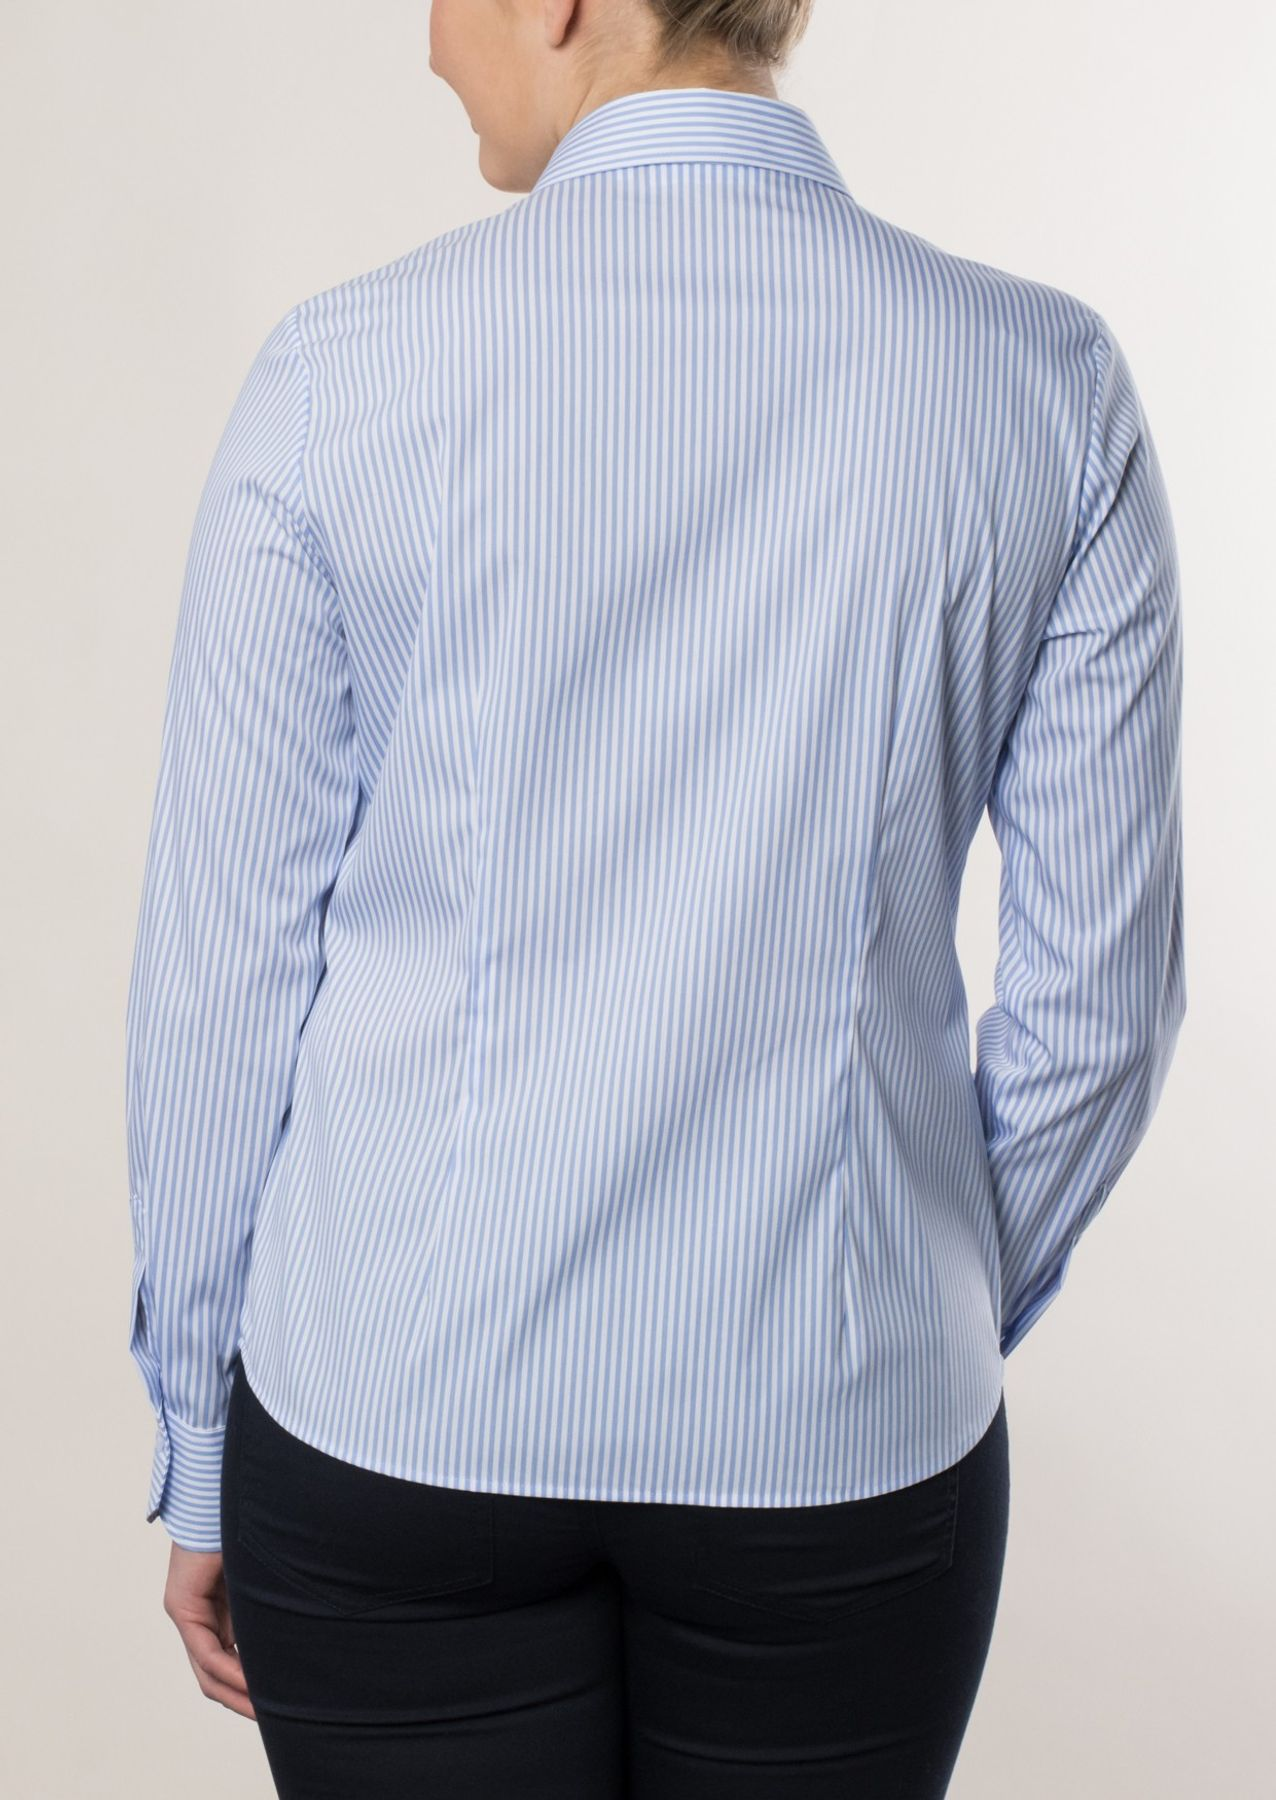 Eterna -  Comfort-Fit - Damen Langarm Bluse in Dunkelblau/ Weiß gestreift  (6017 D390) – Bild 6